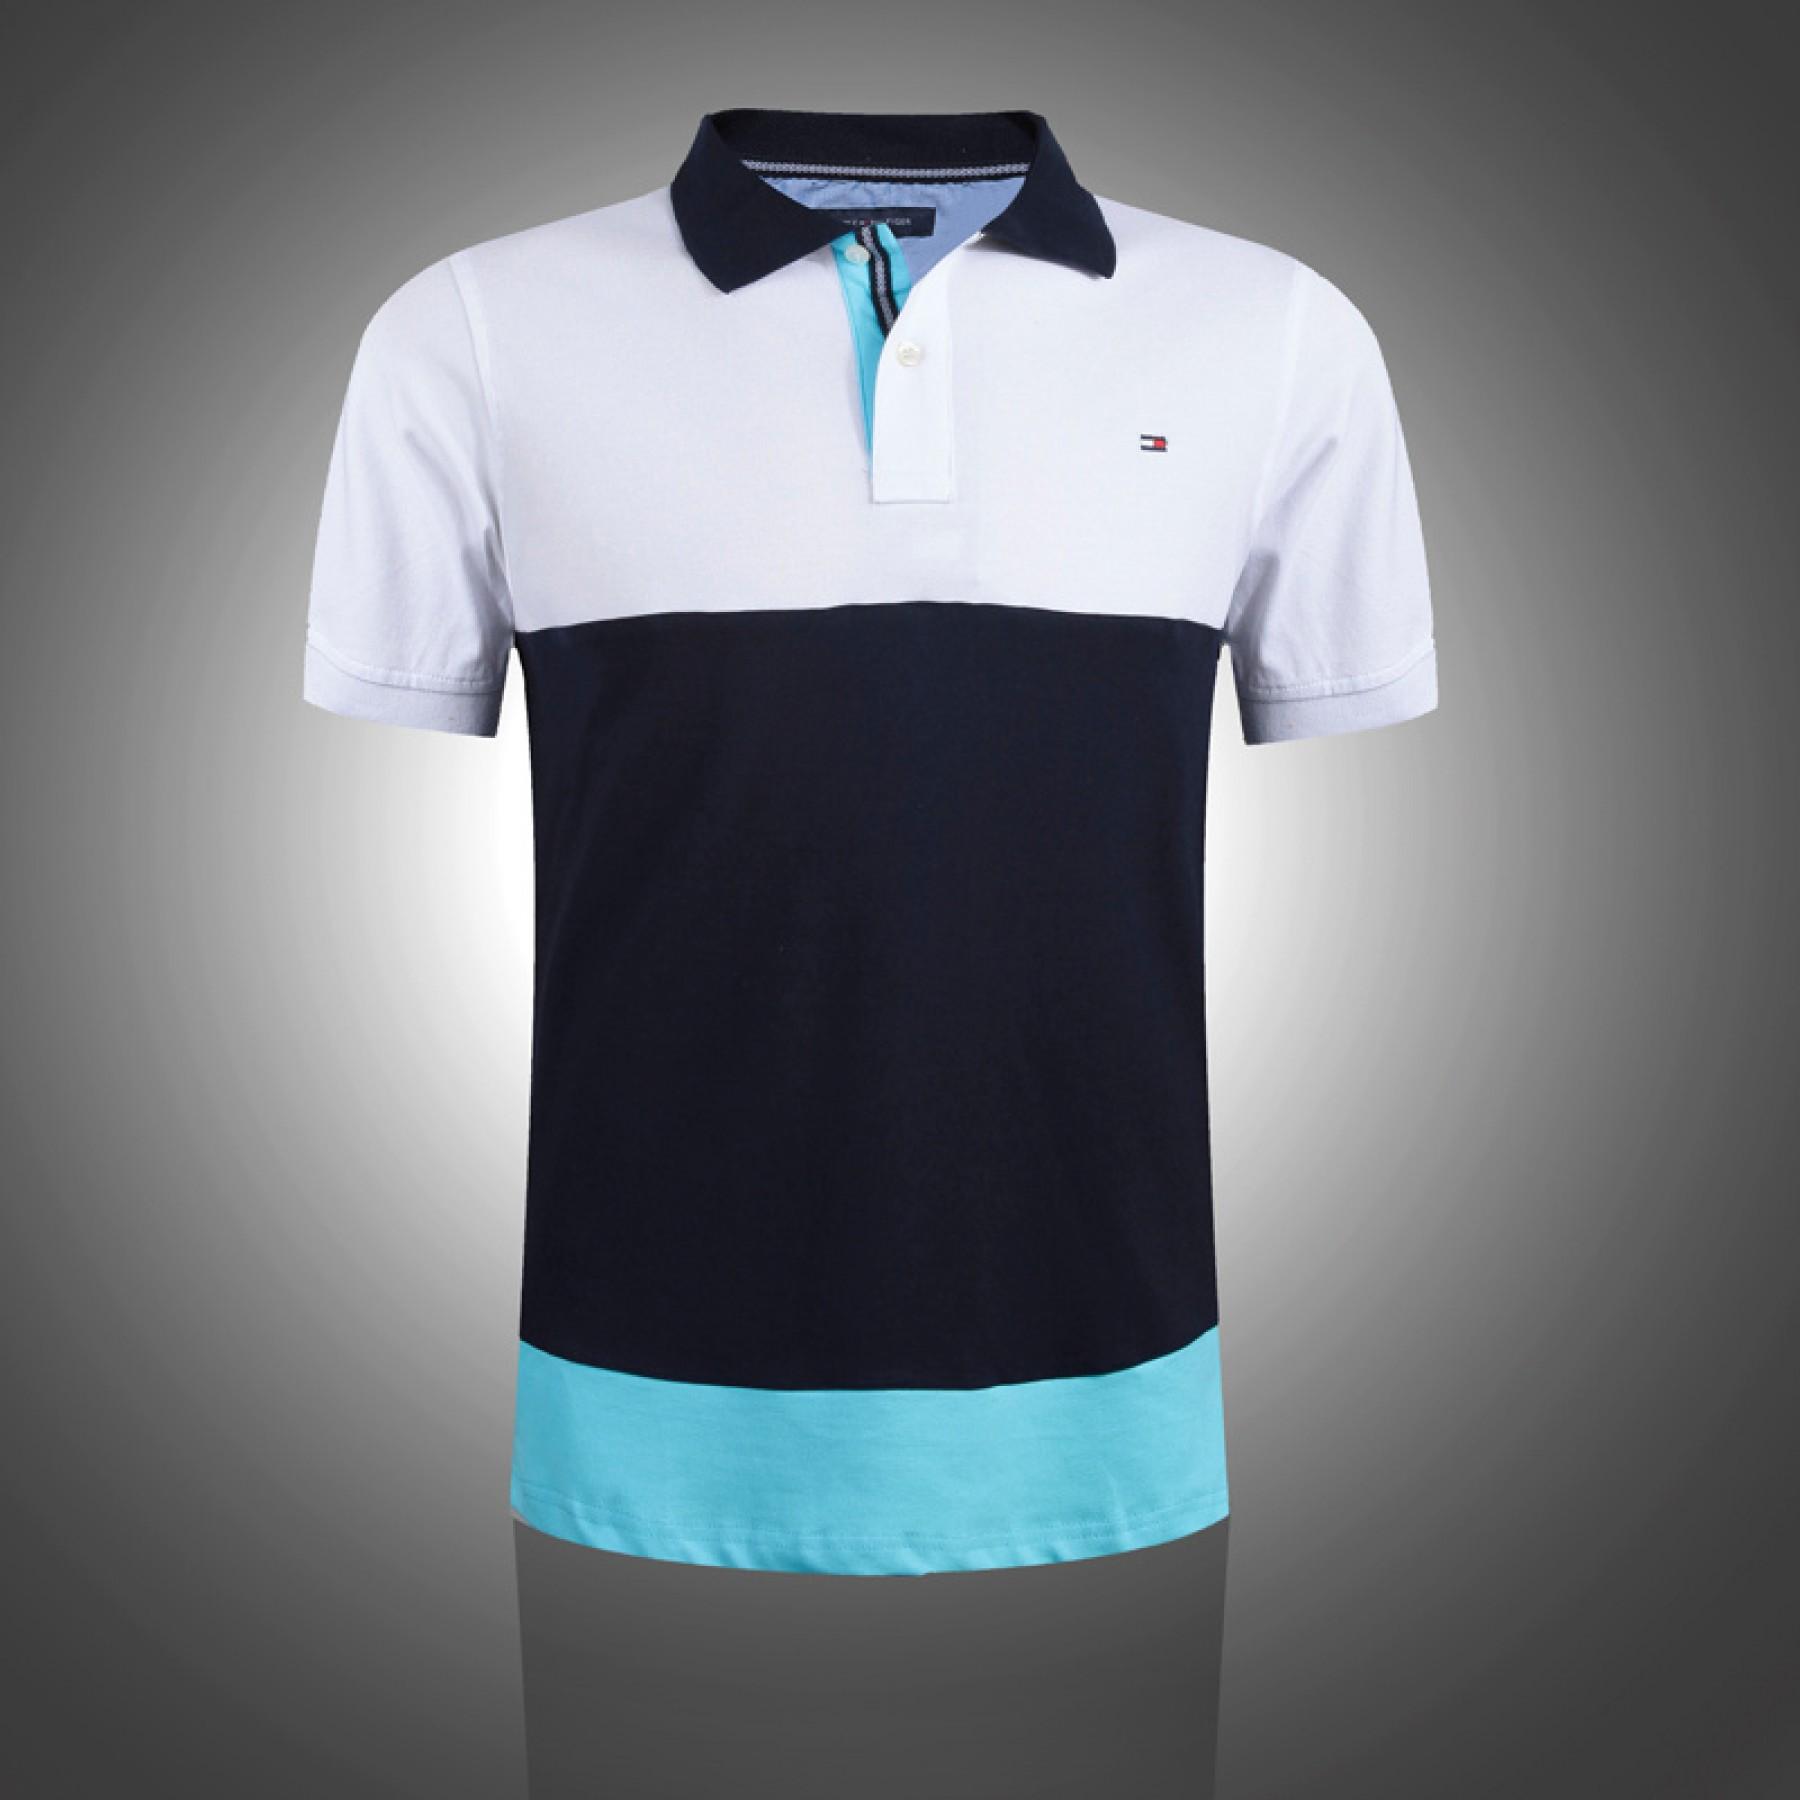 23a0323cb7 Camisa Polo Masculina Tommy Hilfiger Cod 0362